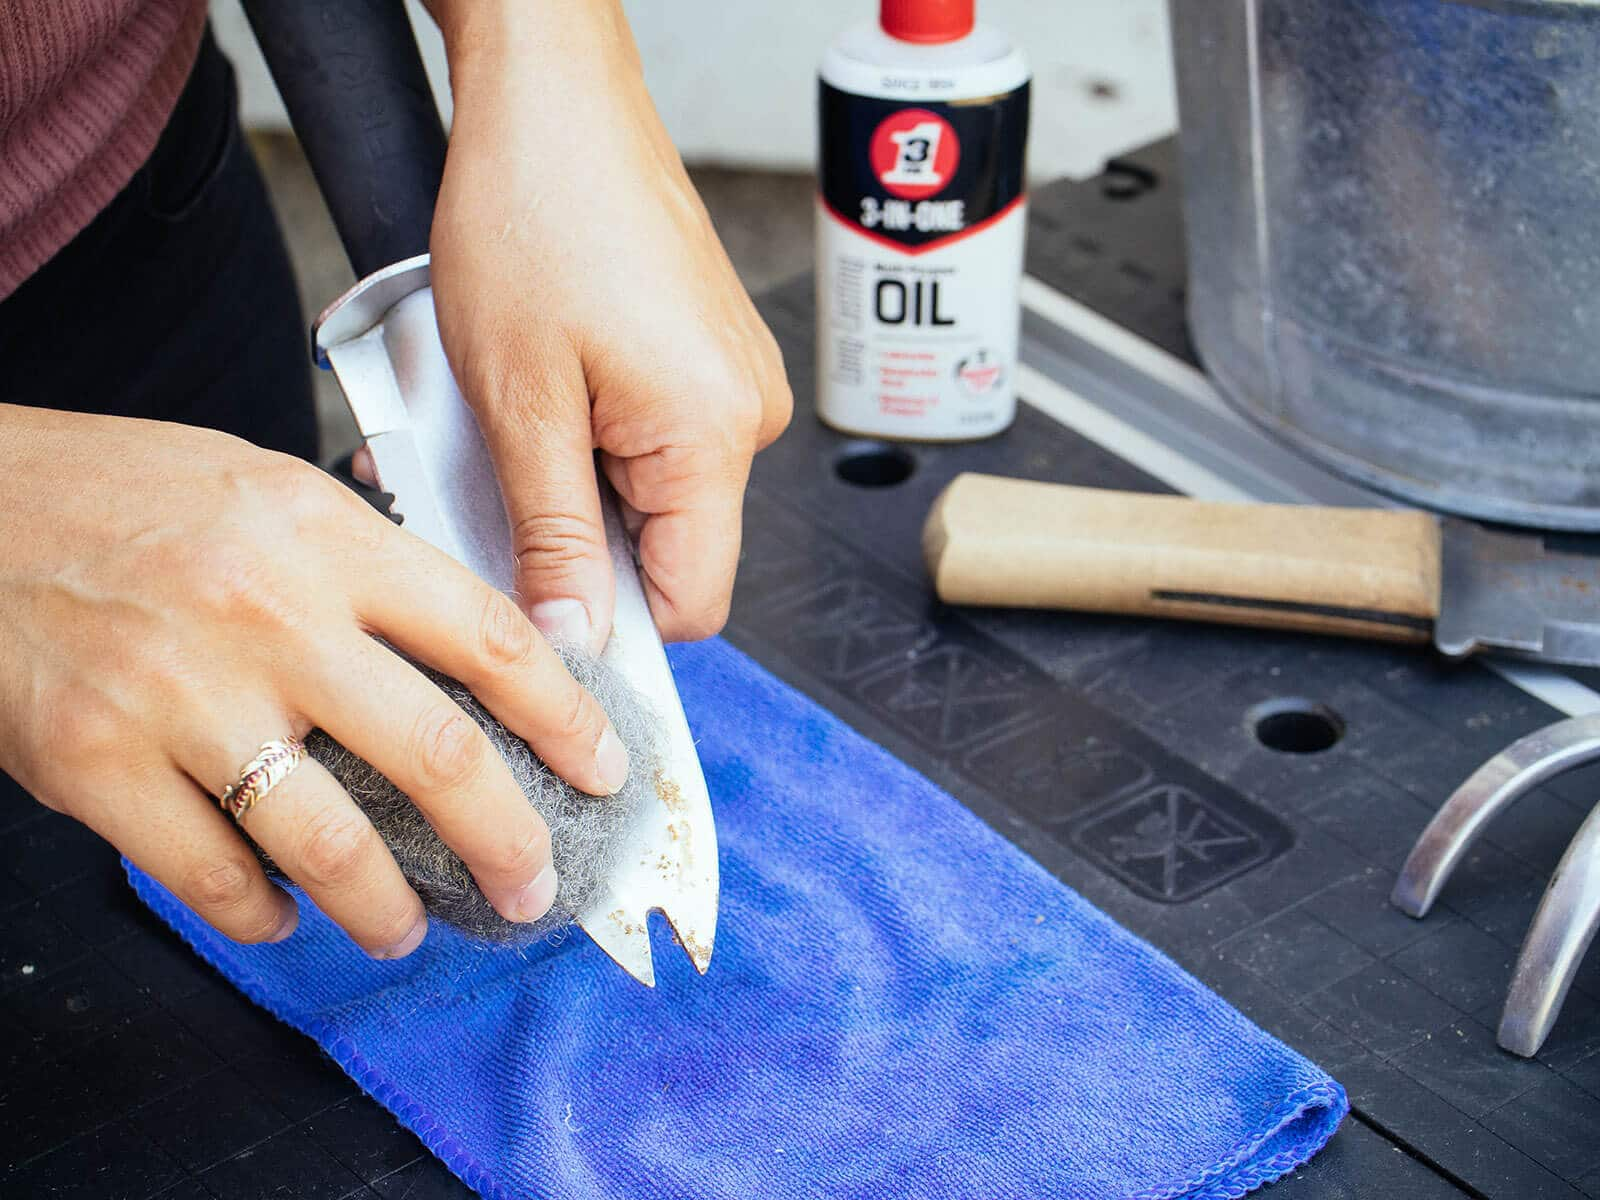 Hand scrubbing rust off a hori hori knife with steel wool